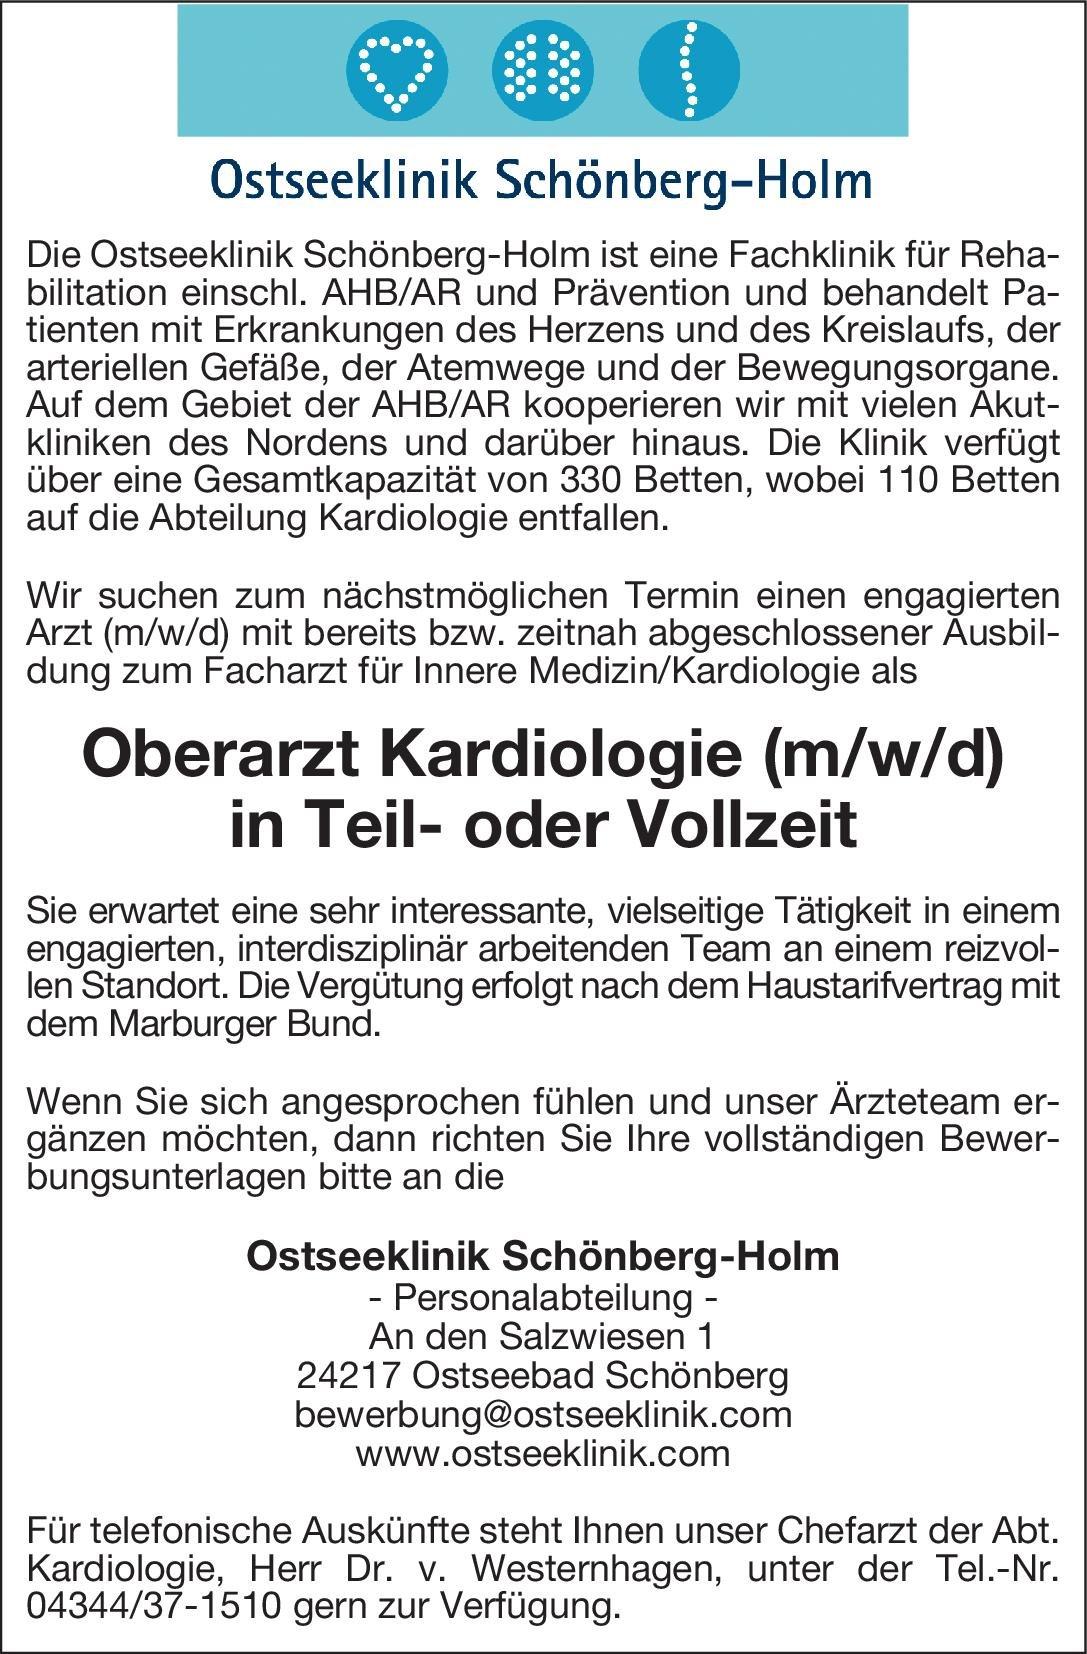 Ostseeklinik Schönberg-Holm Oberarzt Kardiologie (m/w/d)  Innere Medizin und Kardiologie, Innere Medizin Oberarzt